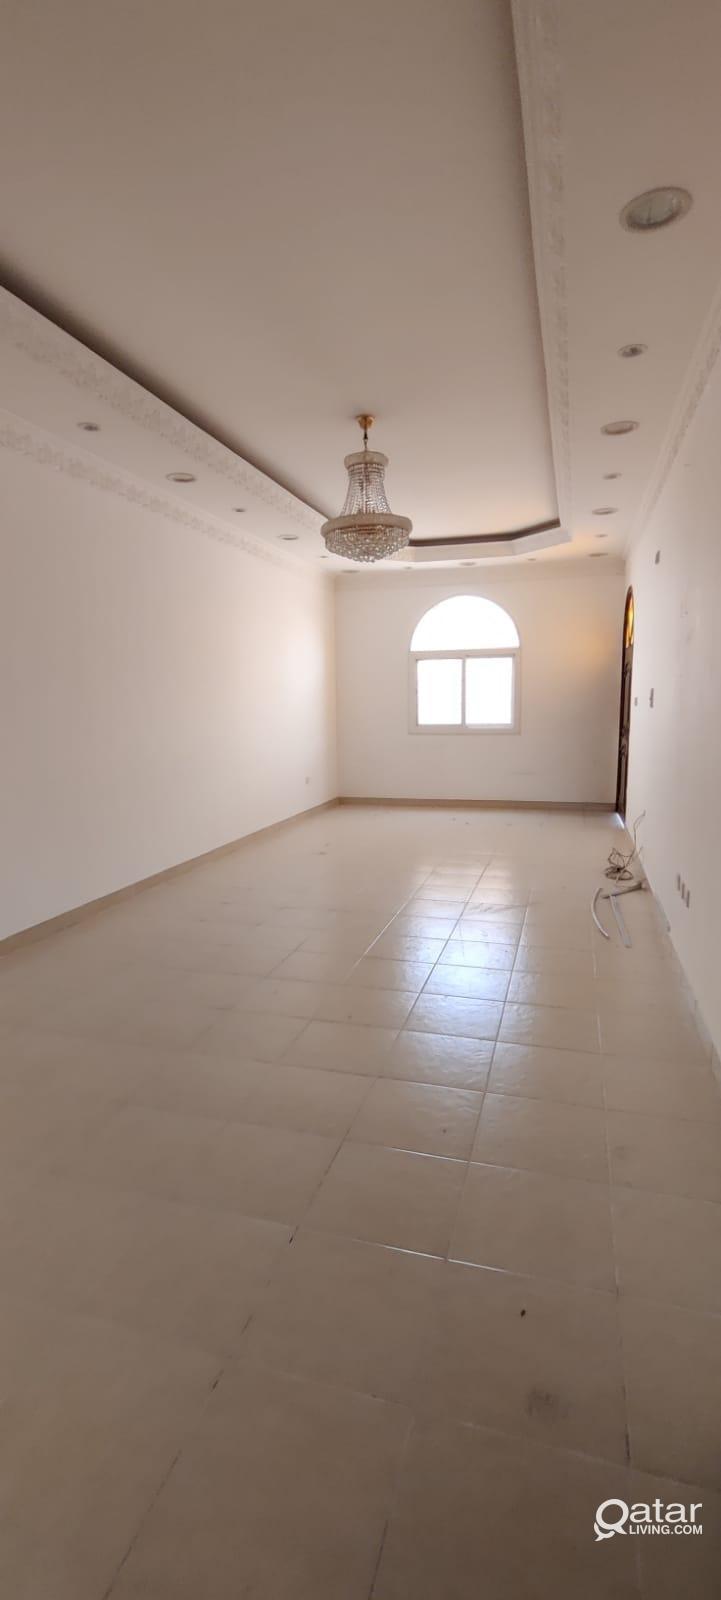 7 Bedroom Villa in Al Waab For Rent